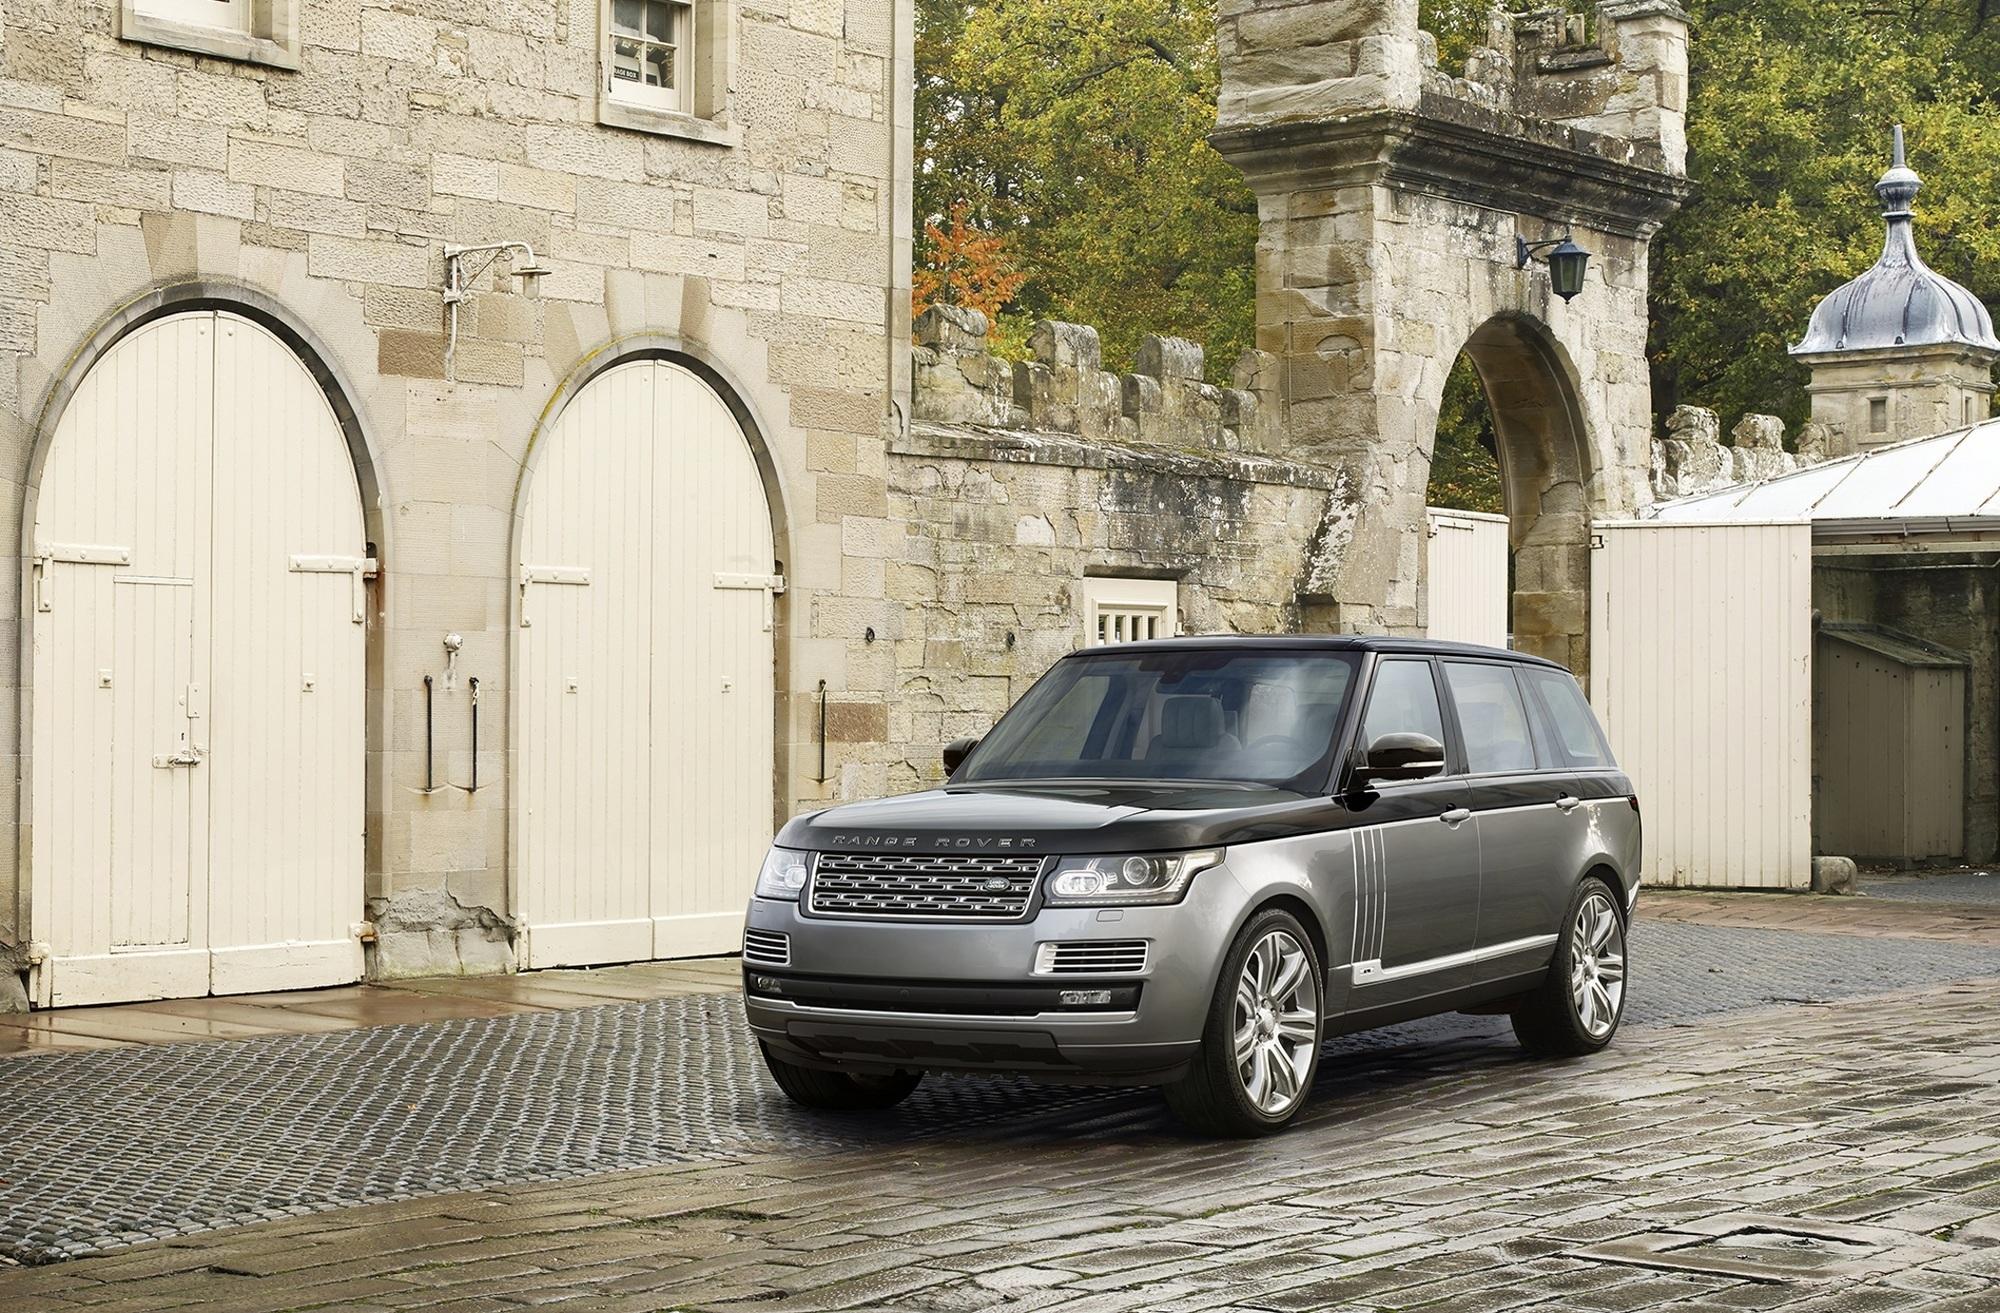 Range Rover SVAutobiography - Nobel-SUV mit optionalem Klappstuhl